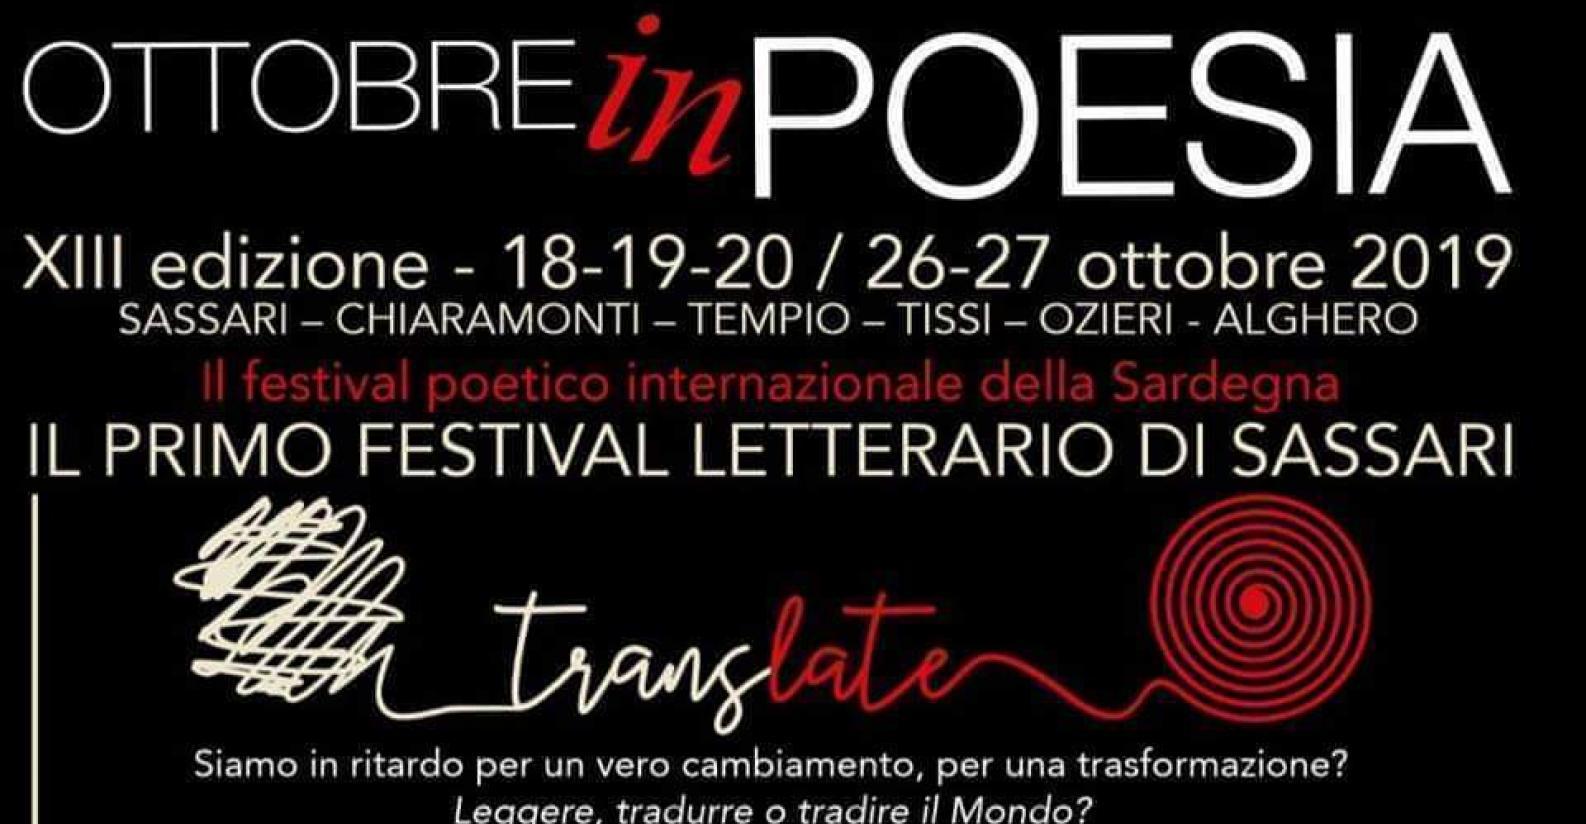 Ottobre in Poesia